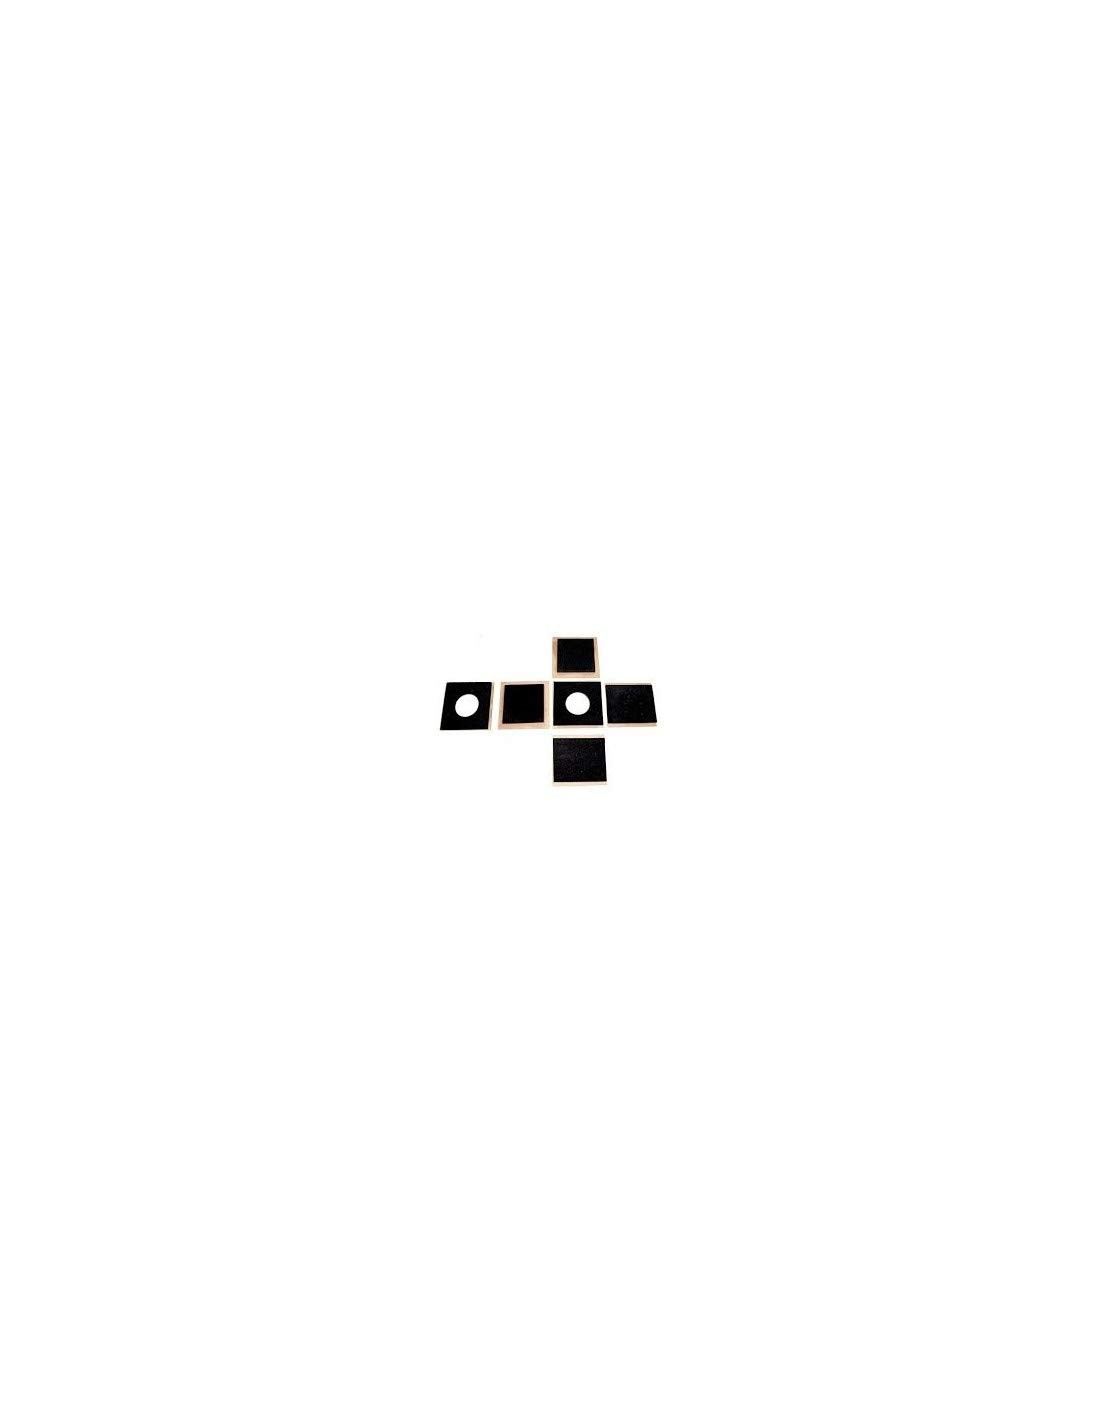 2.0x3.9x6.3 Balais de Charbon pour MILWAUKEE AGV13-125QX meuleuse 5x10x16mm